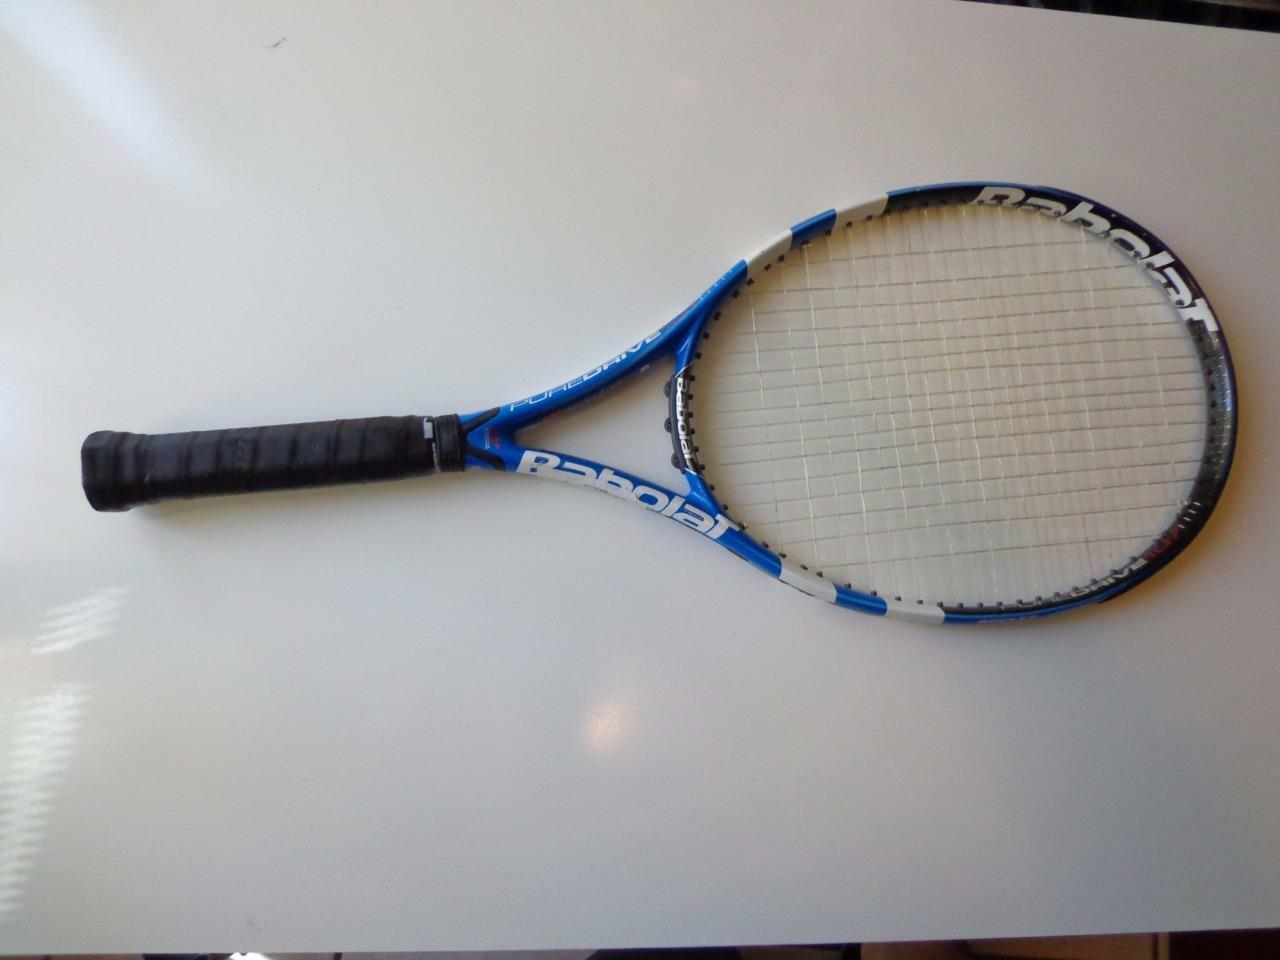 Babolat Pure Drive Gt 107 cabeza 4 1 2 Grip Tenis Raqueta